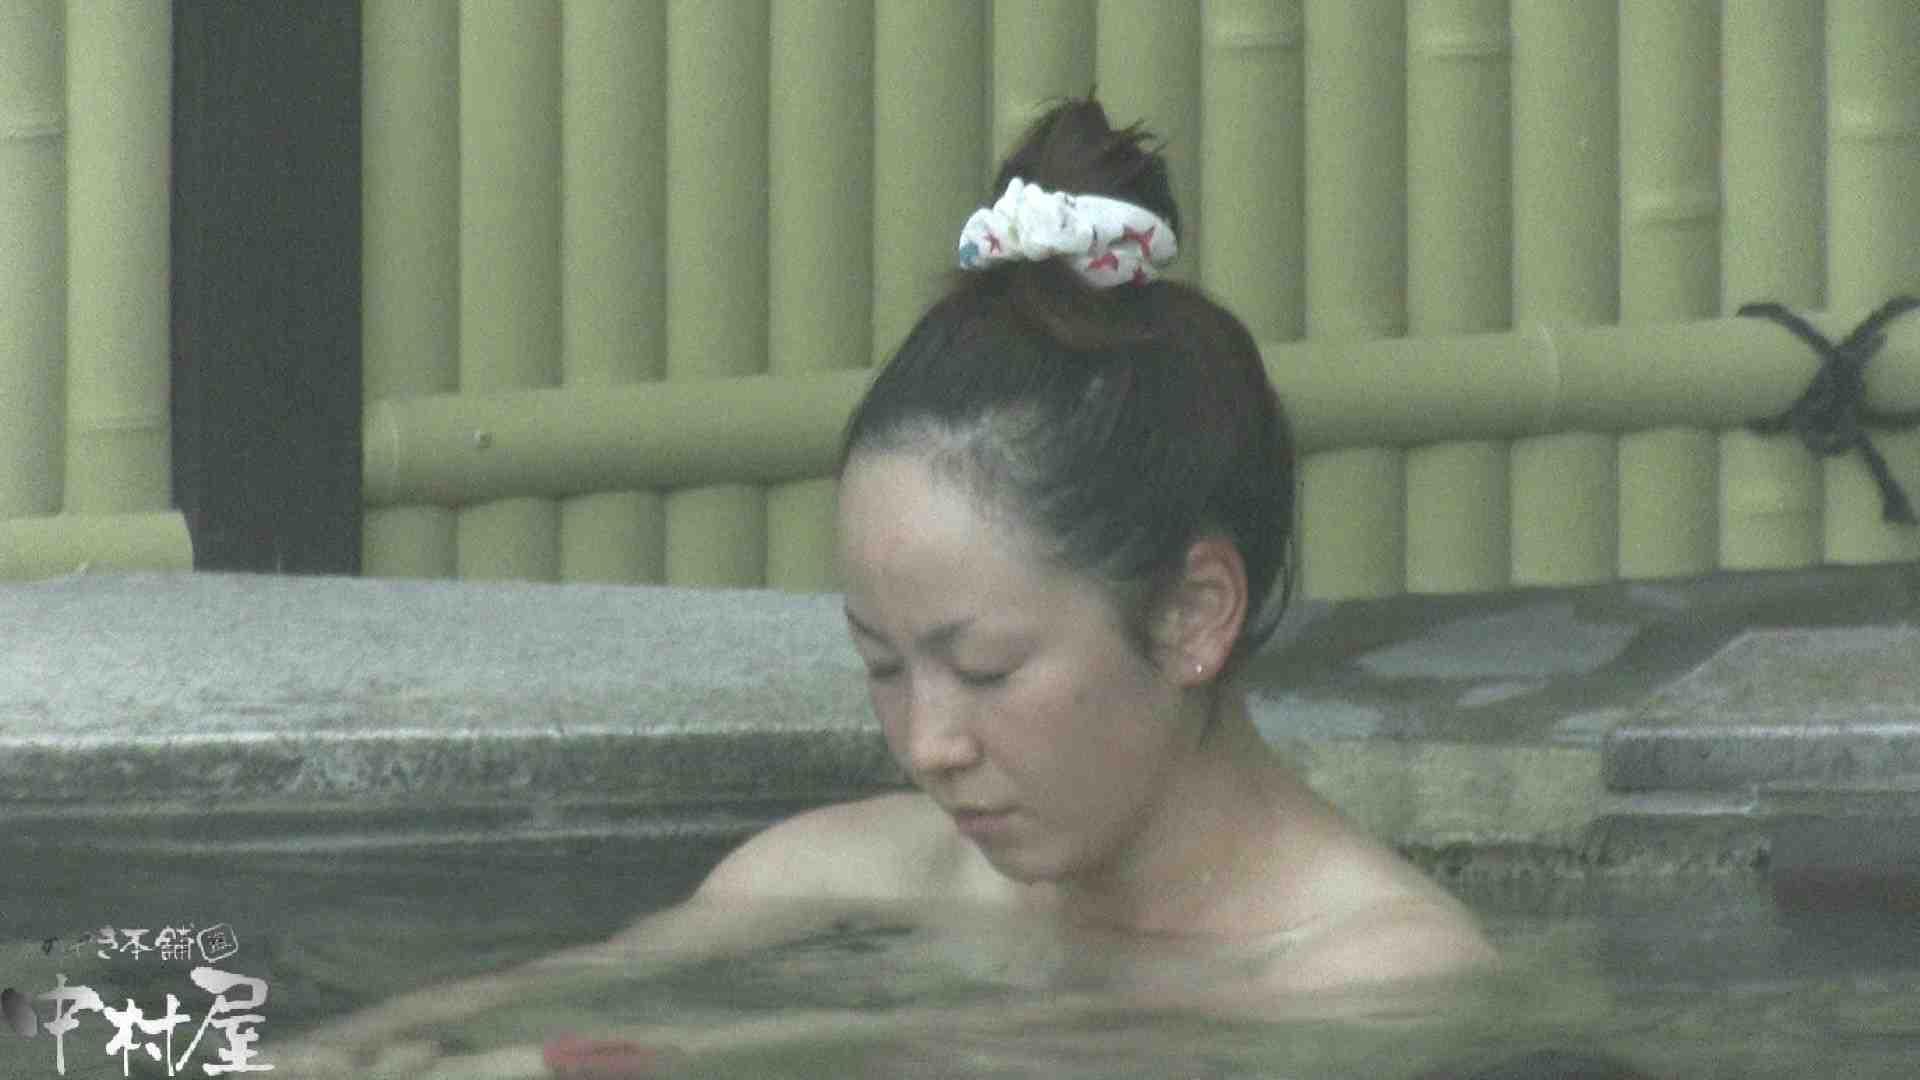 Aquaな露天風呂Vol.911 0  88連発 72